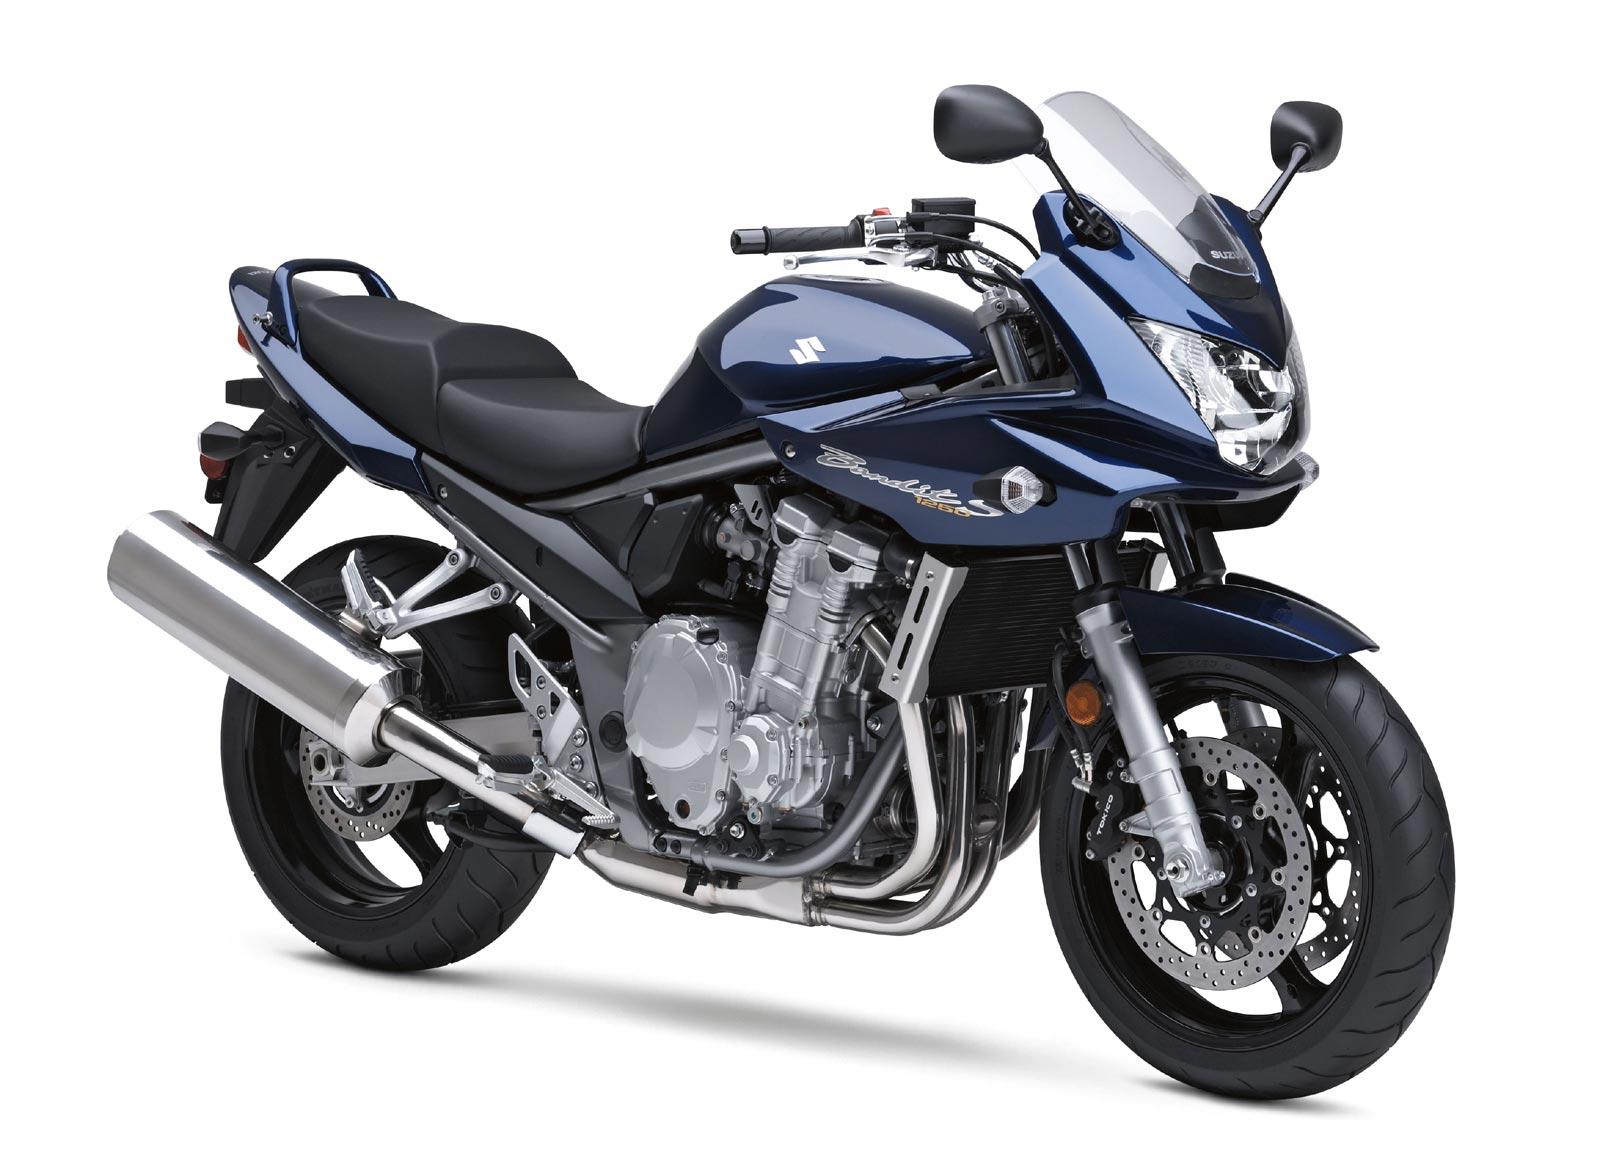 Suzuki Extended Protection